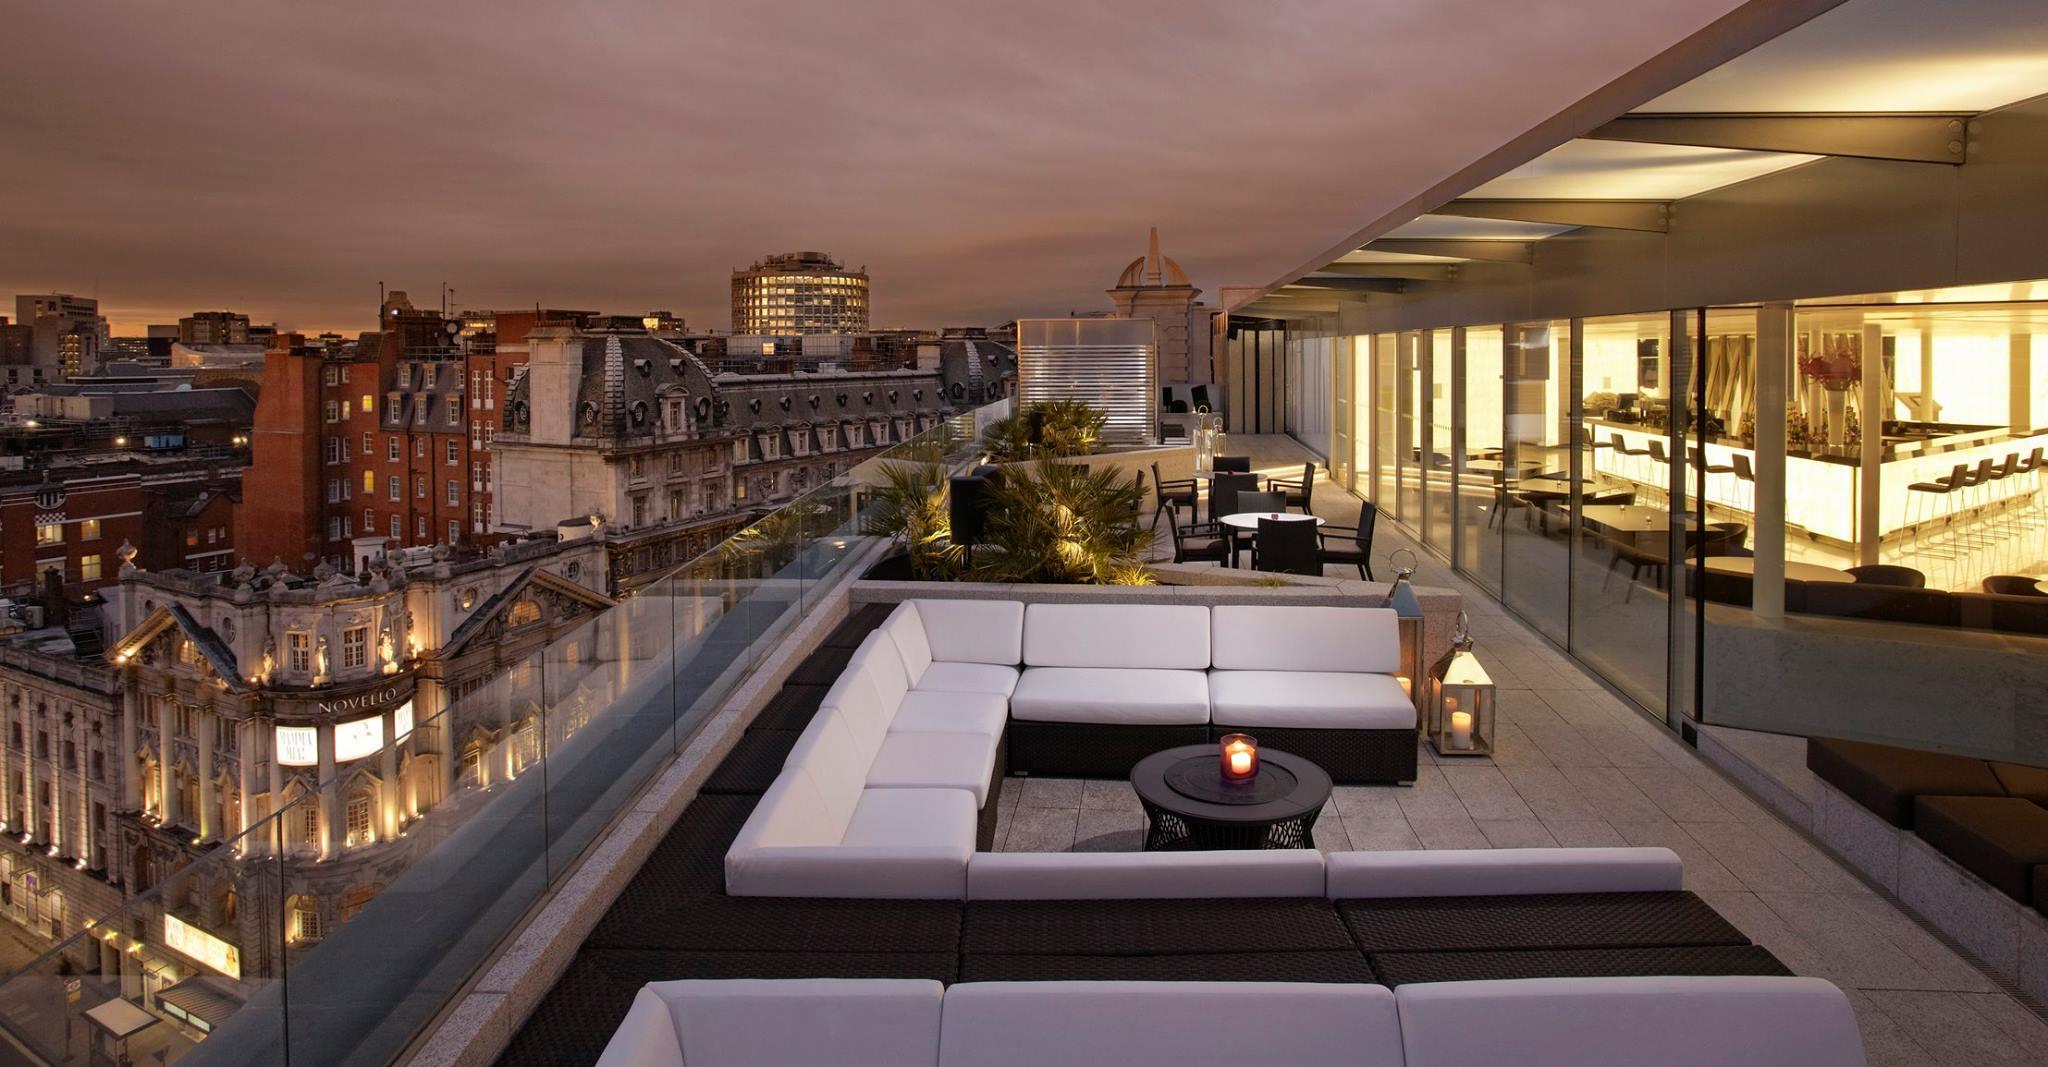 The Radio Rooftop Bar at ME London